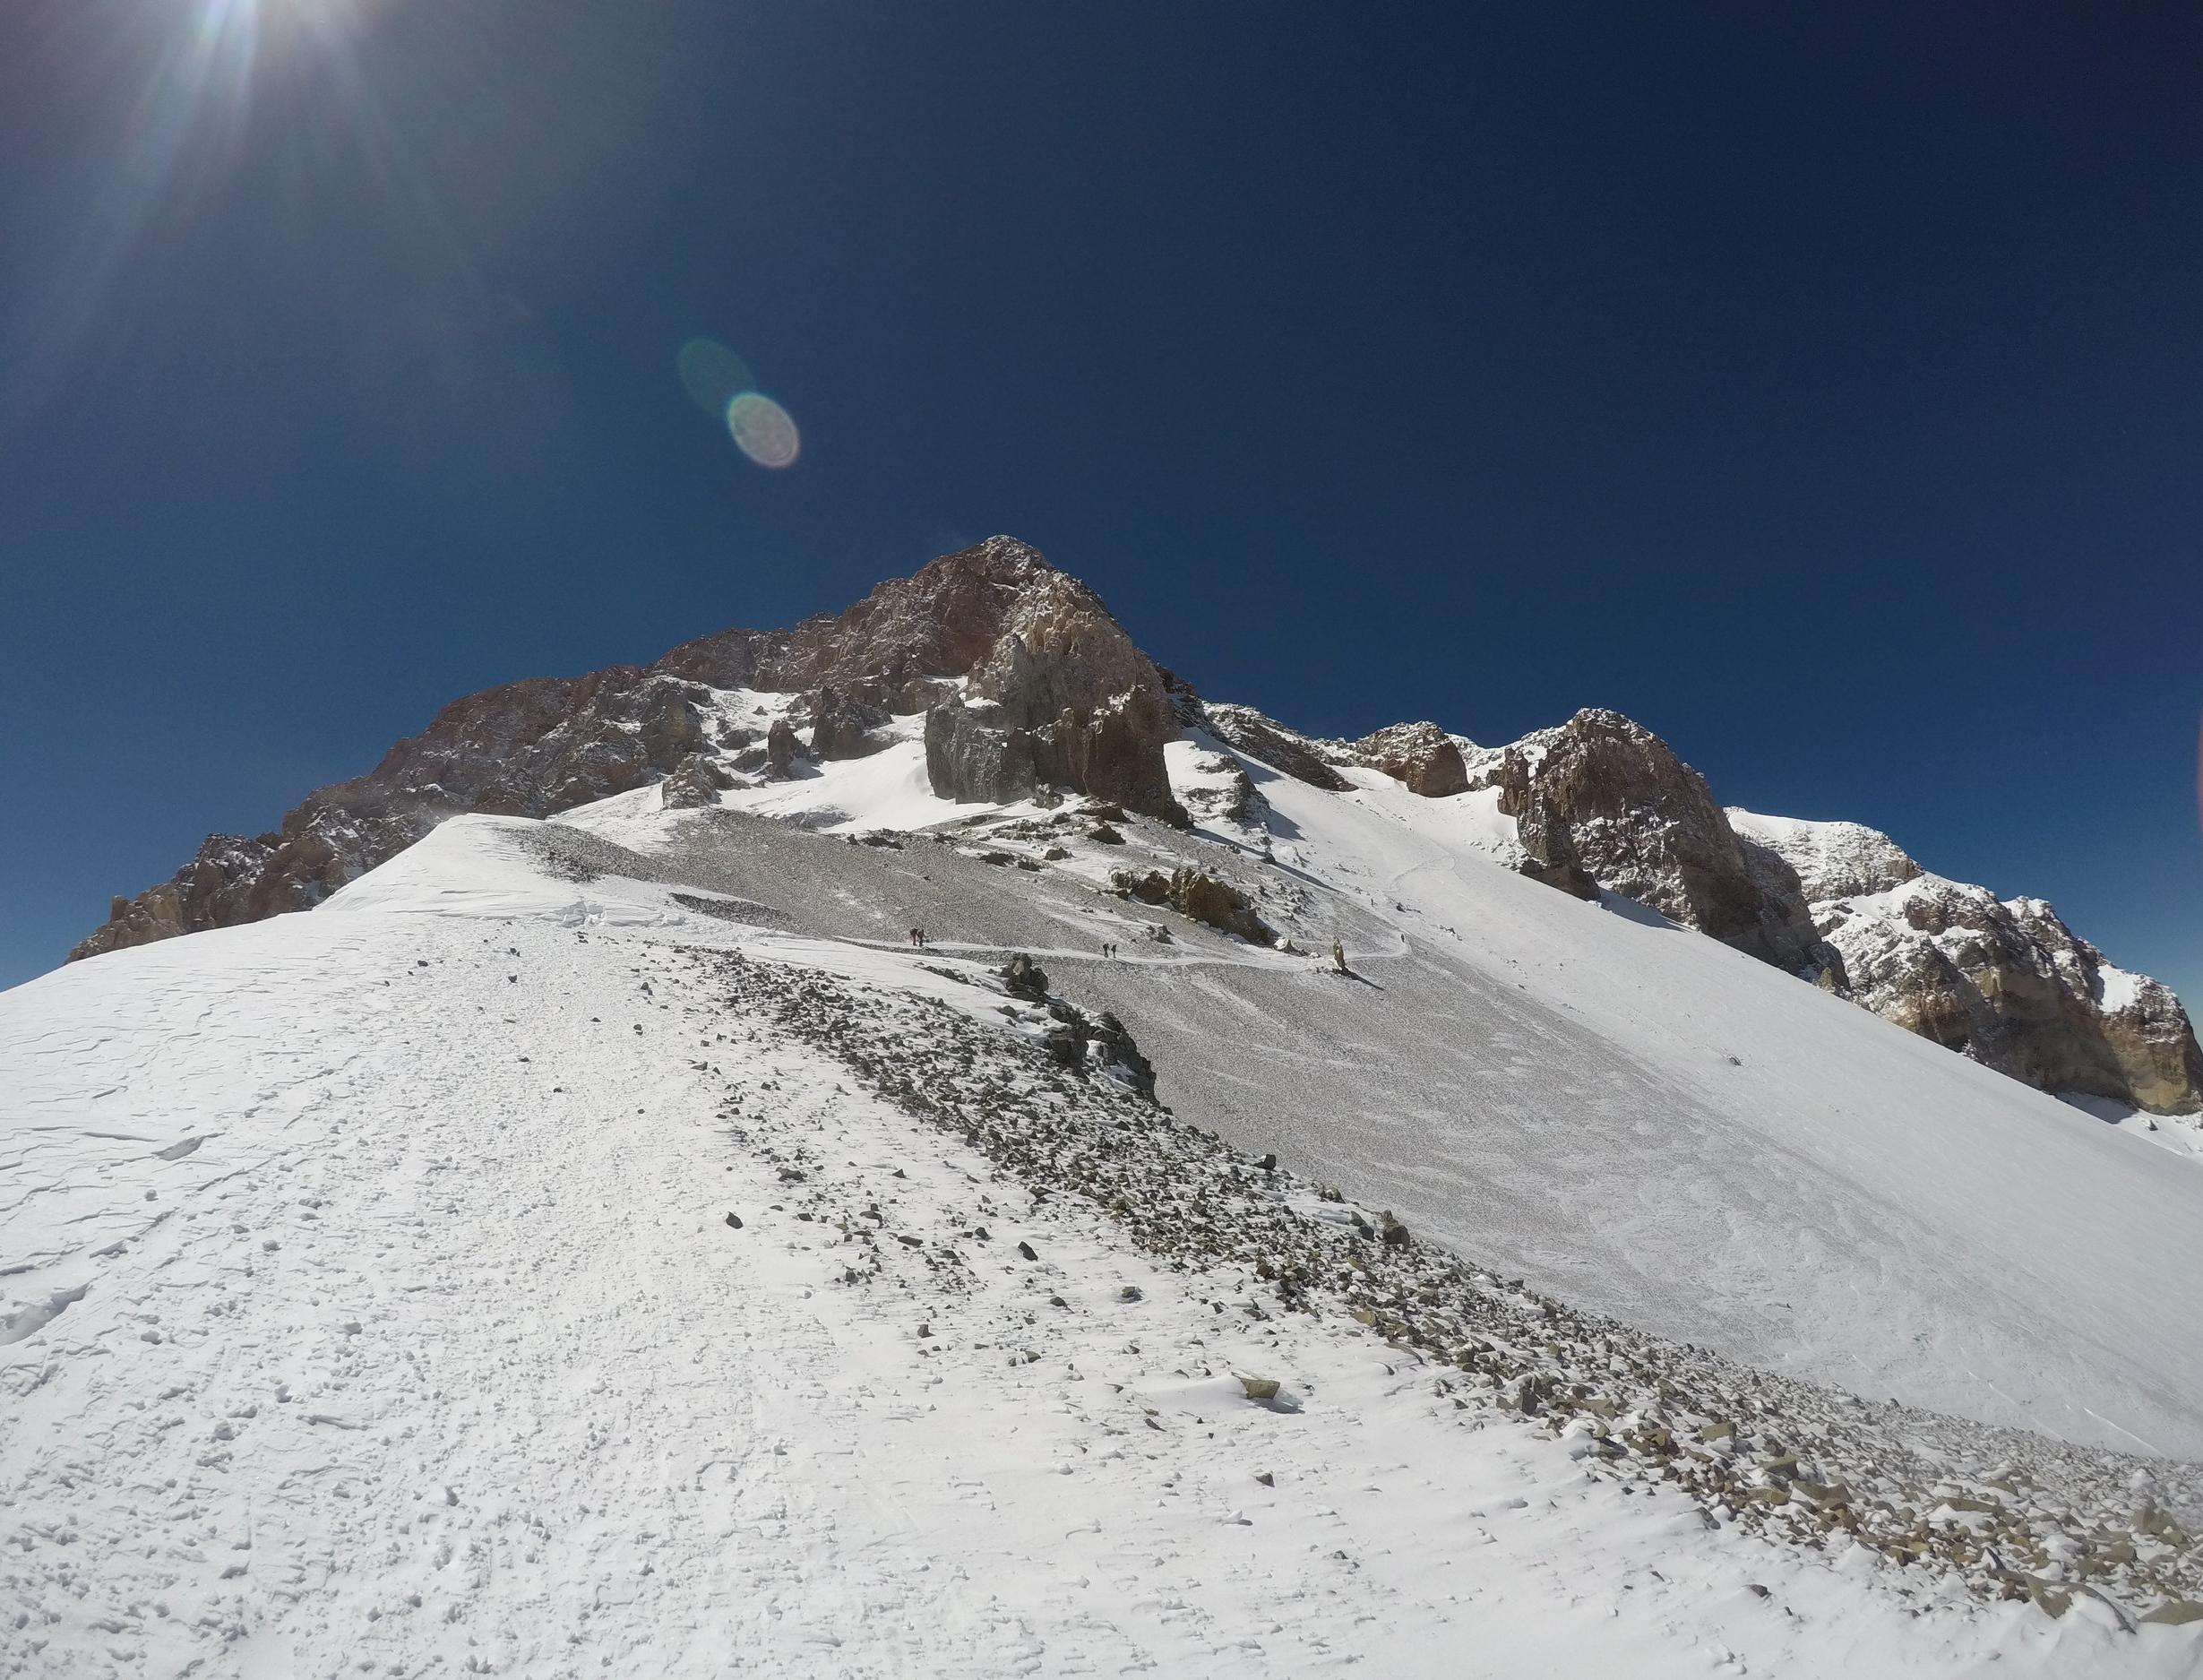 Between Camp III and the summit